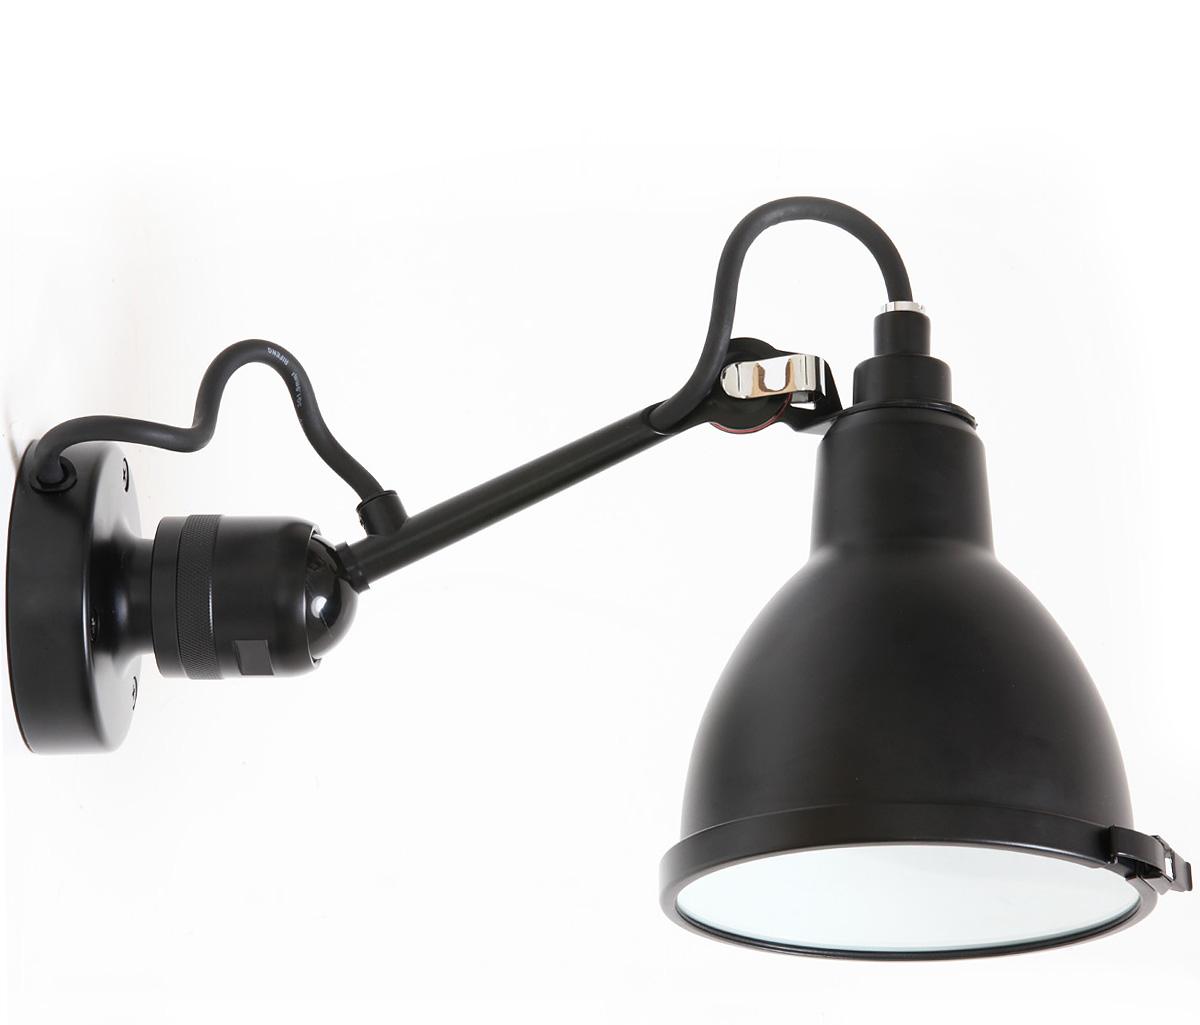 Badezimmer Wandlampe N 304 Mit Kugelgelenk Casa Lumi